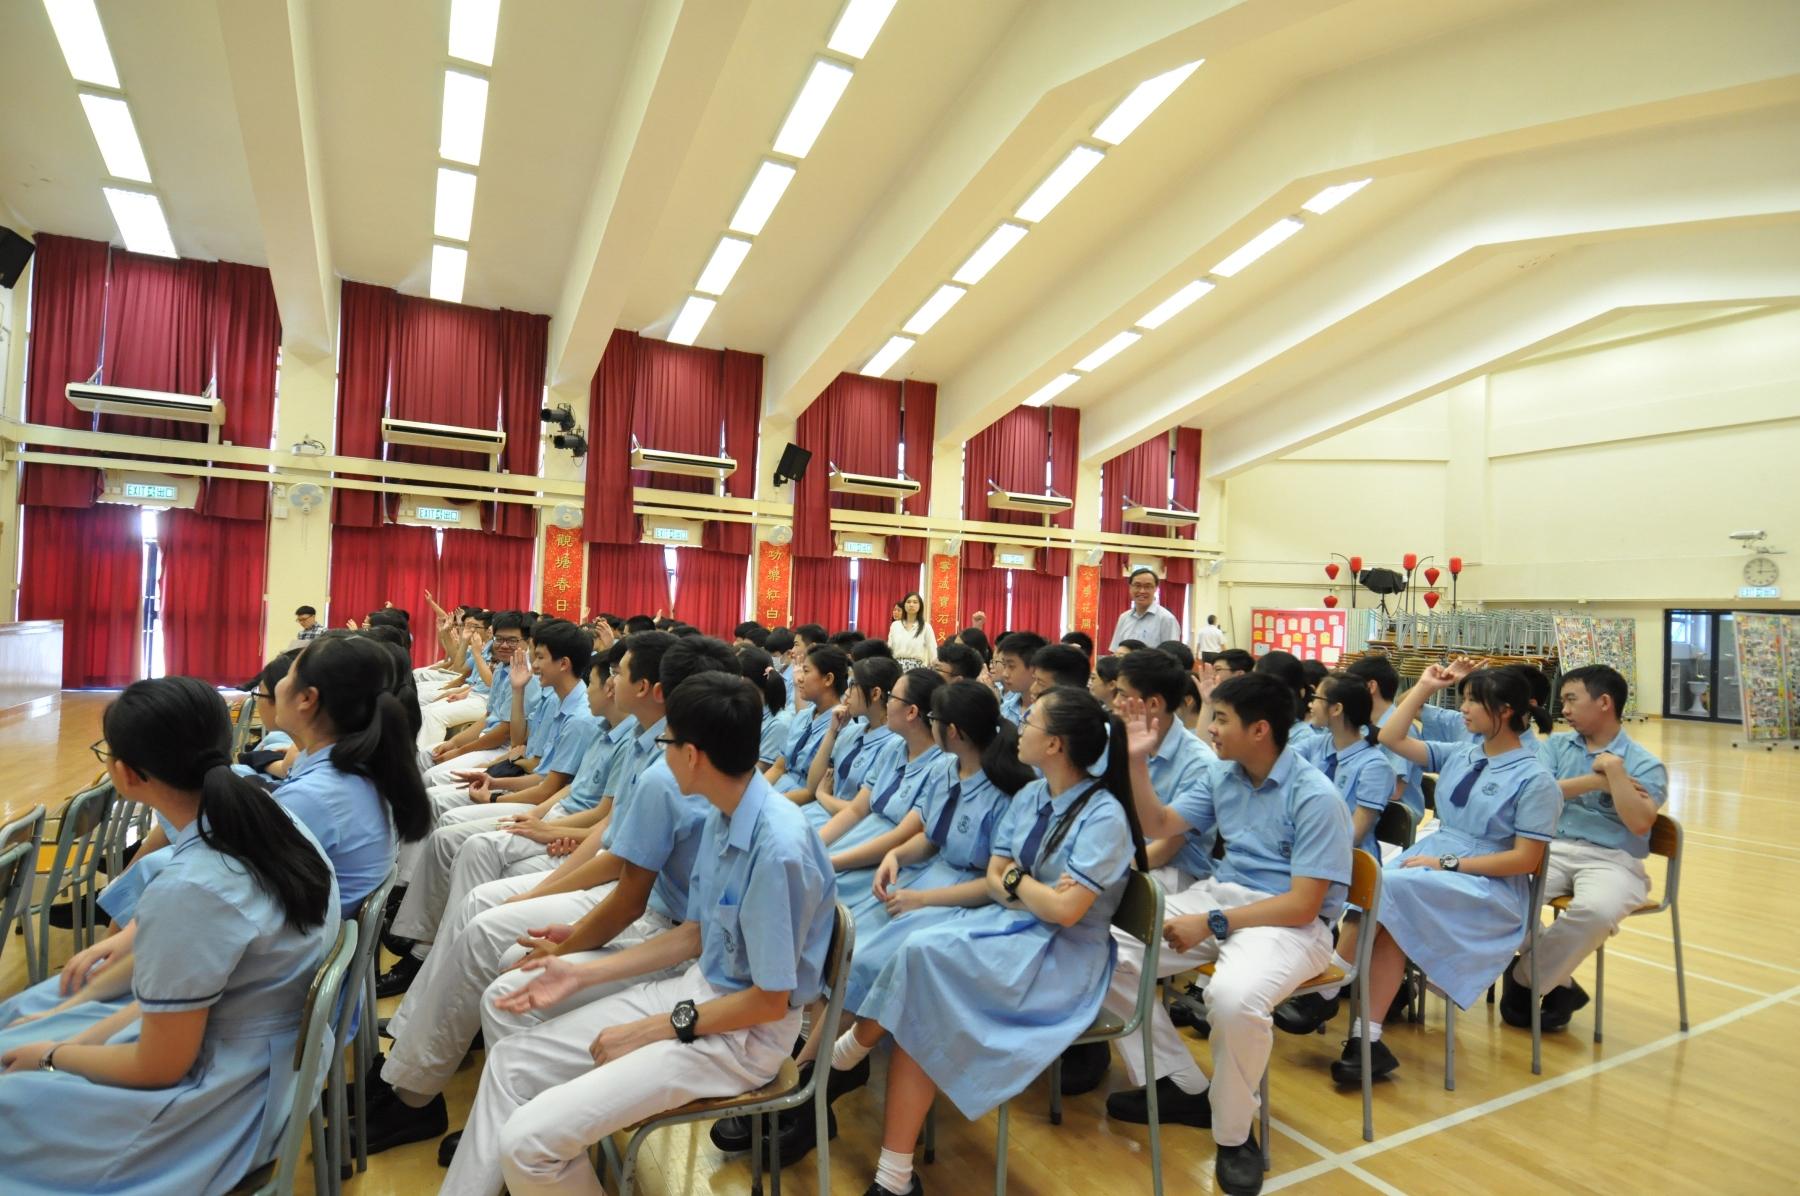 http://www.npc.edu.hk/sites/default/files/dsc_0195_1.jpg